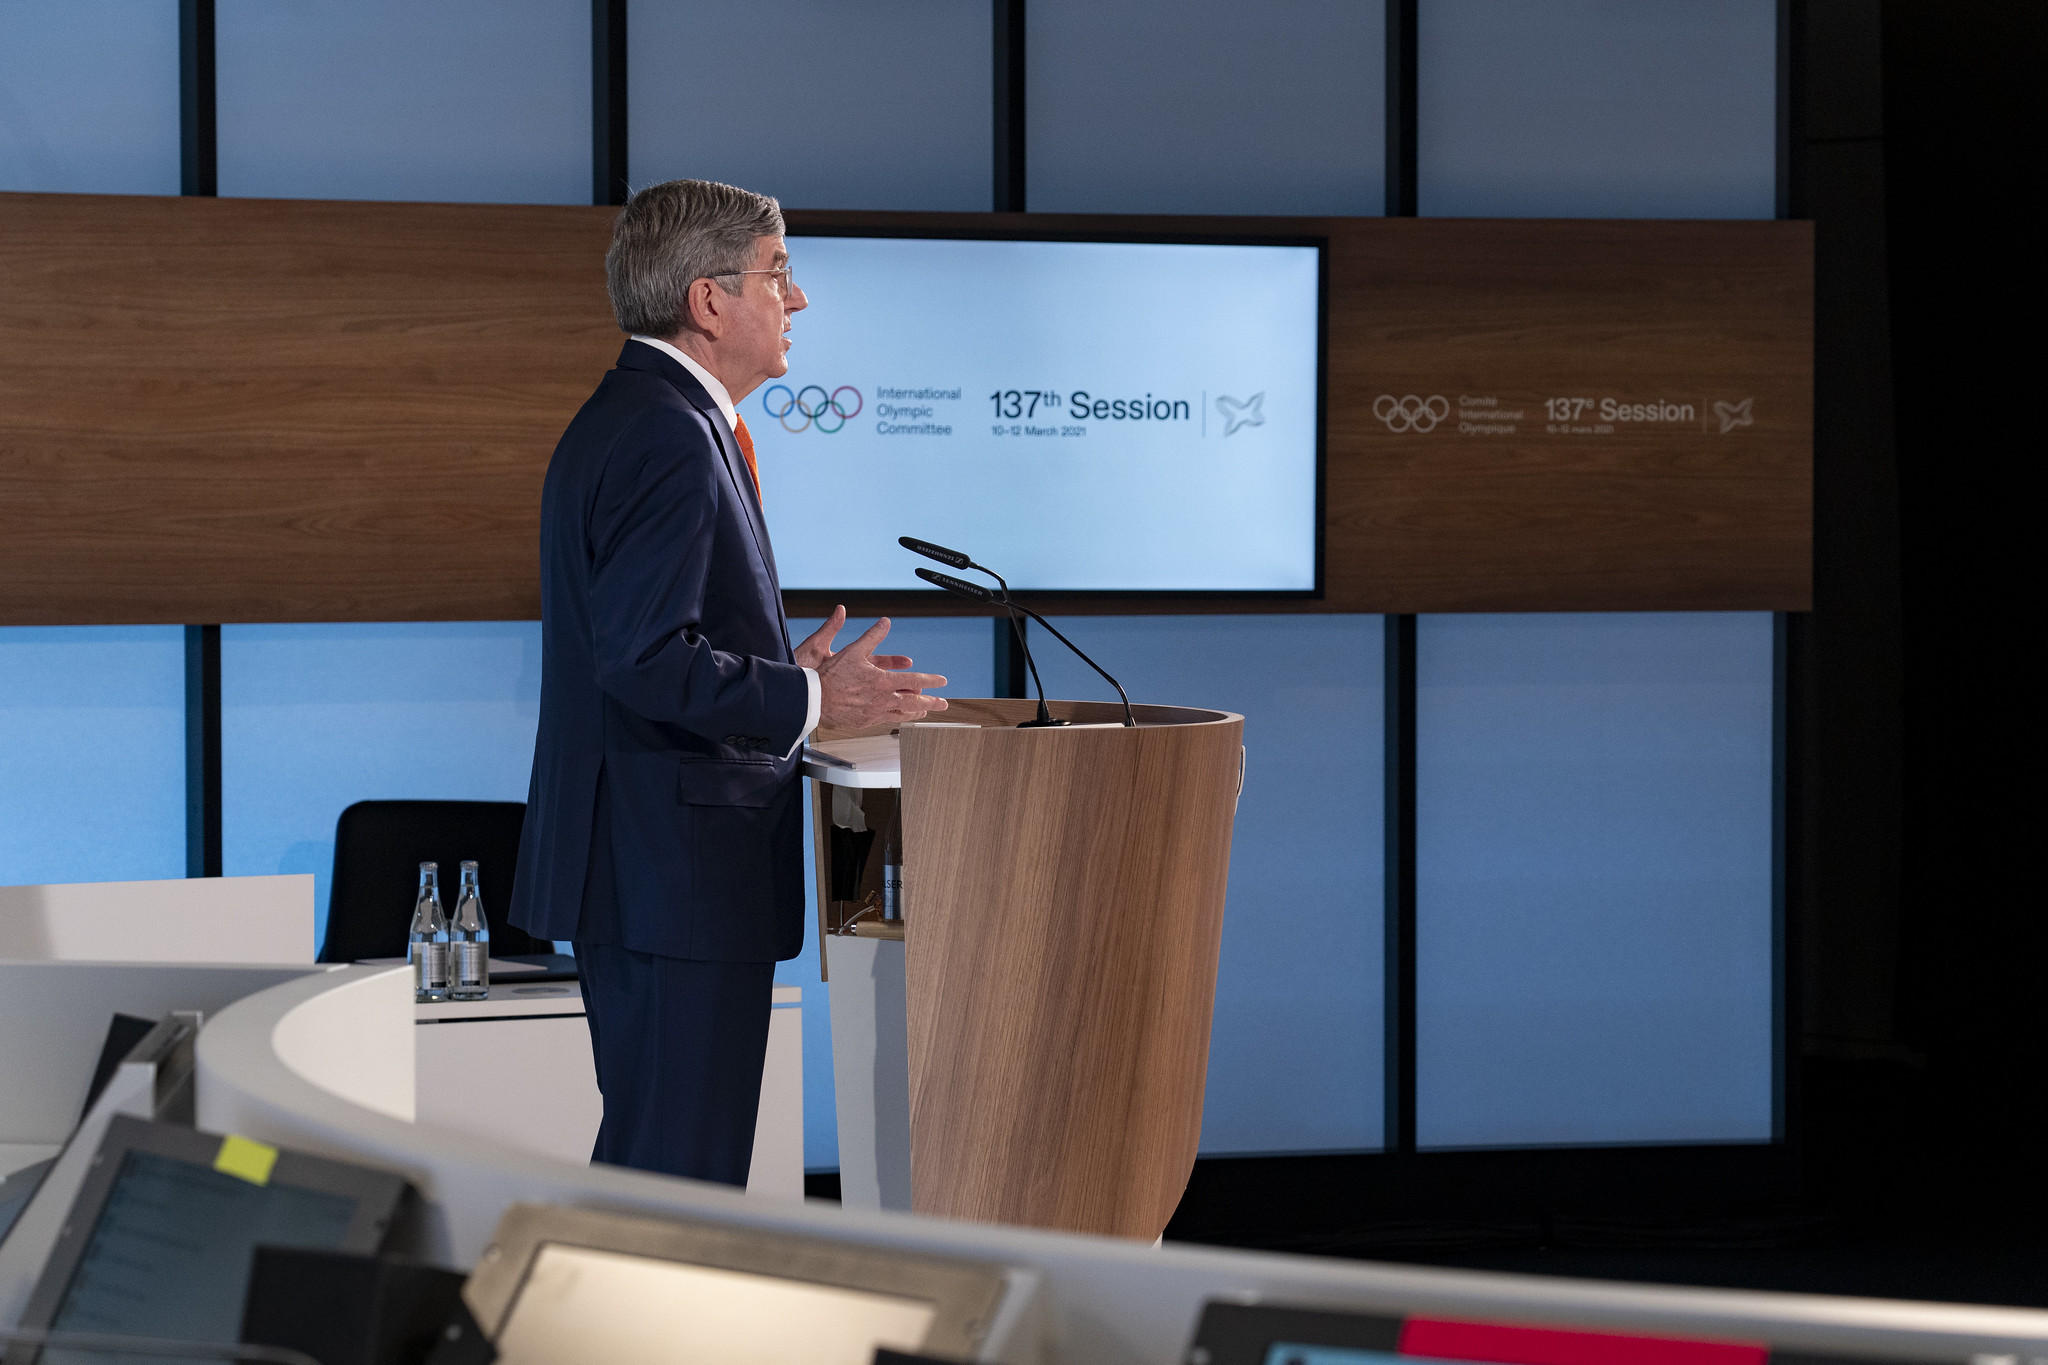 IOC President Thomas Bach said the new strategic roadmap would help prepare the organisation for a post-coronavirus world ©IOC